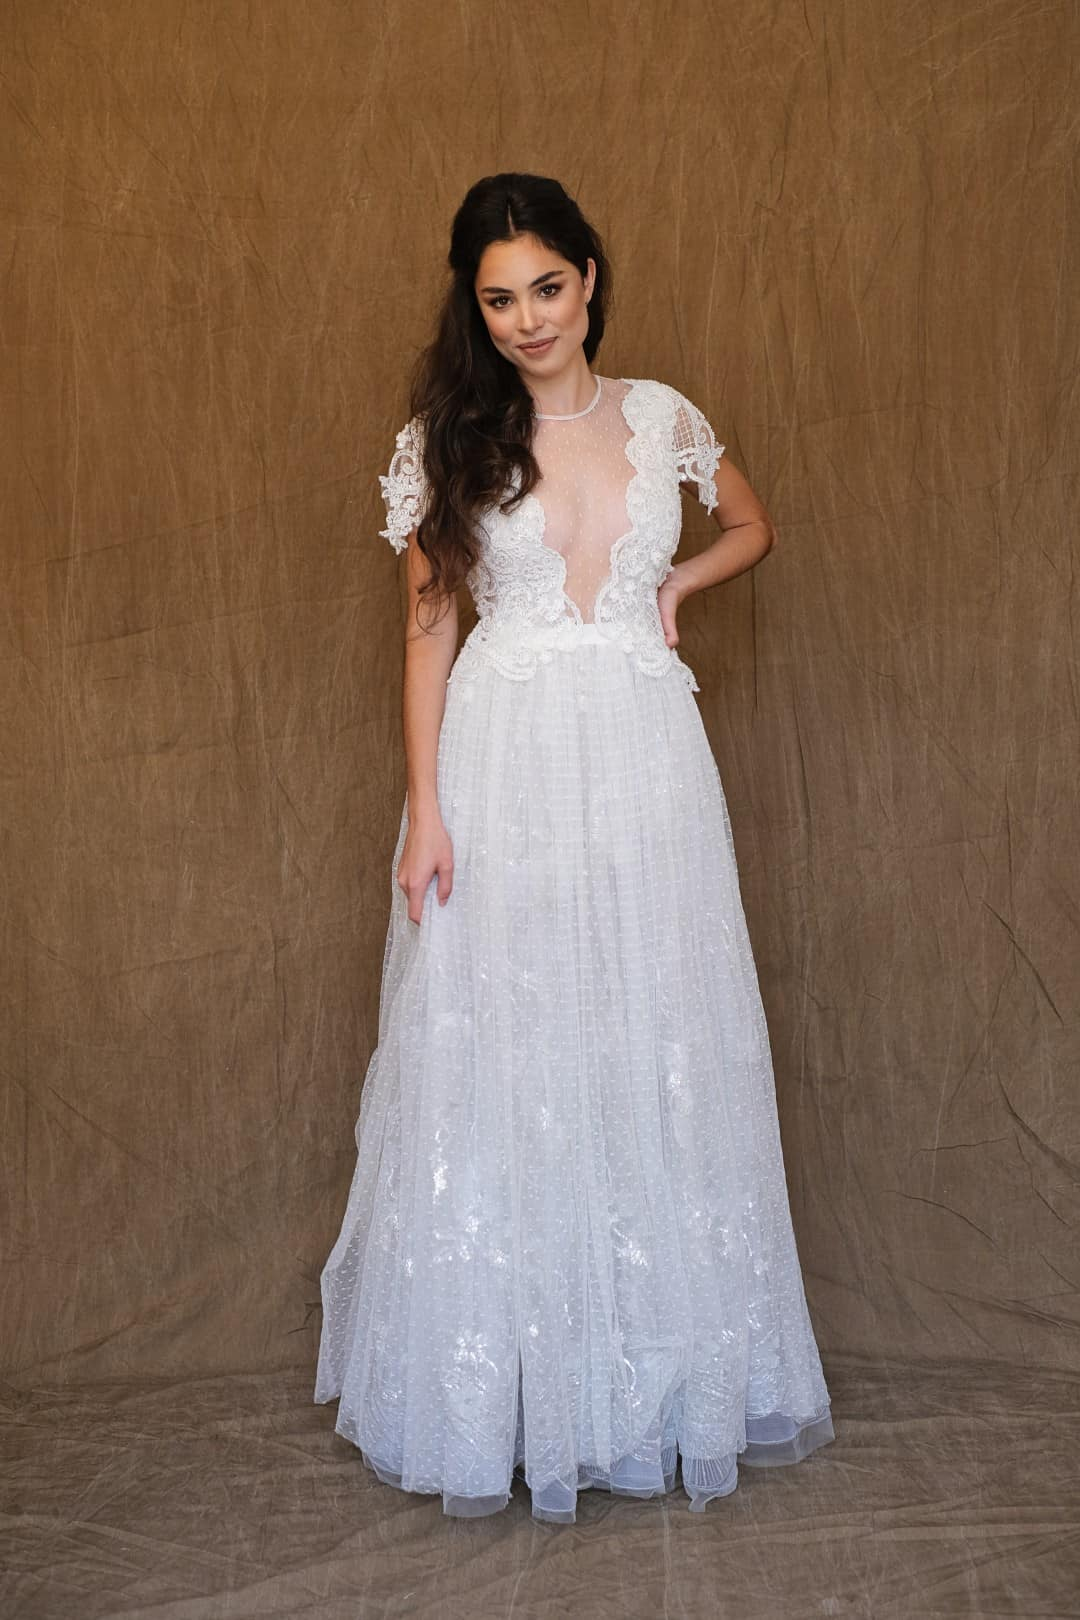 Jemné a romantické svadobné šaty - Marco&Maria - 2017-1007-front